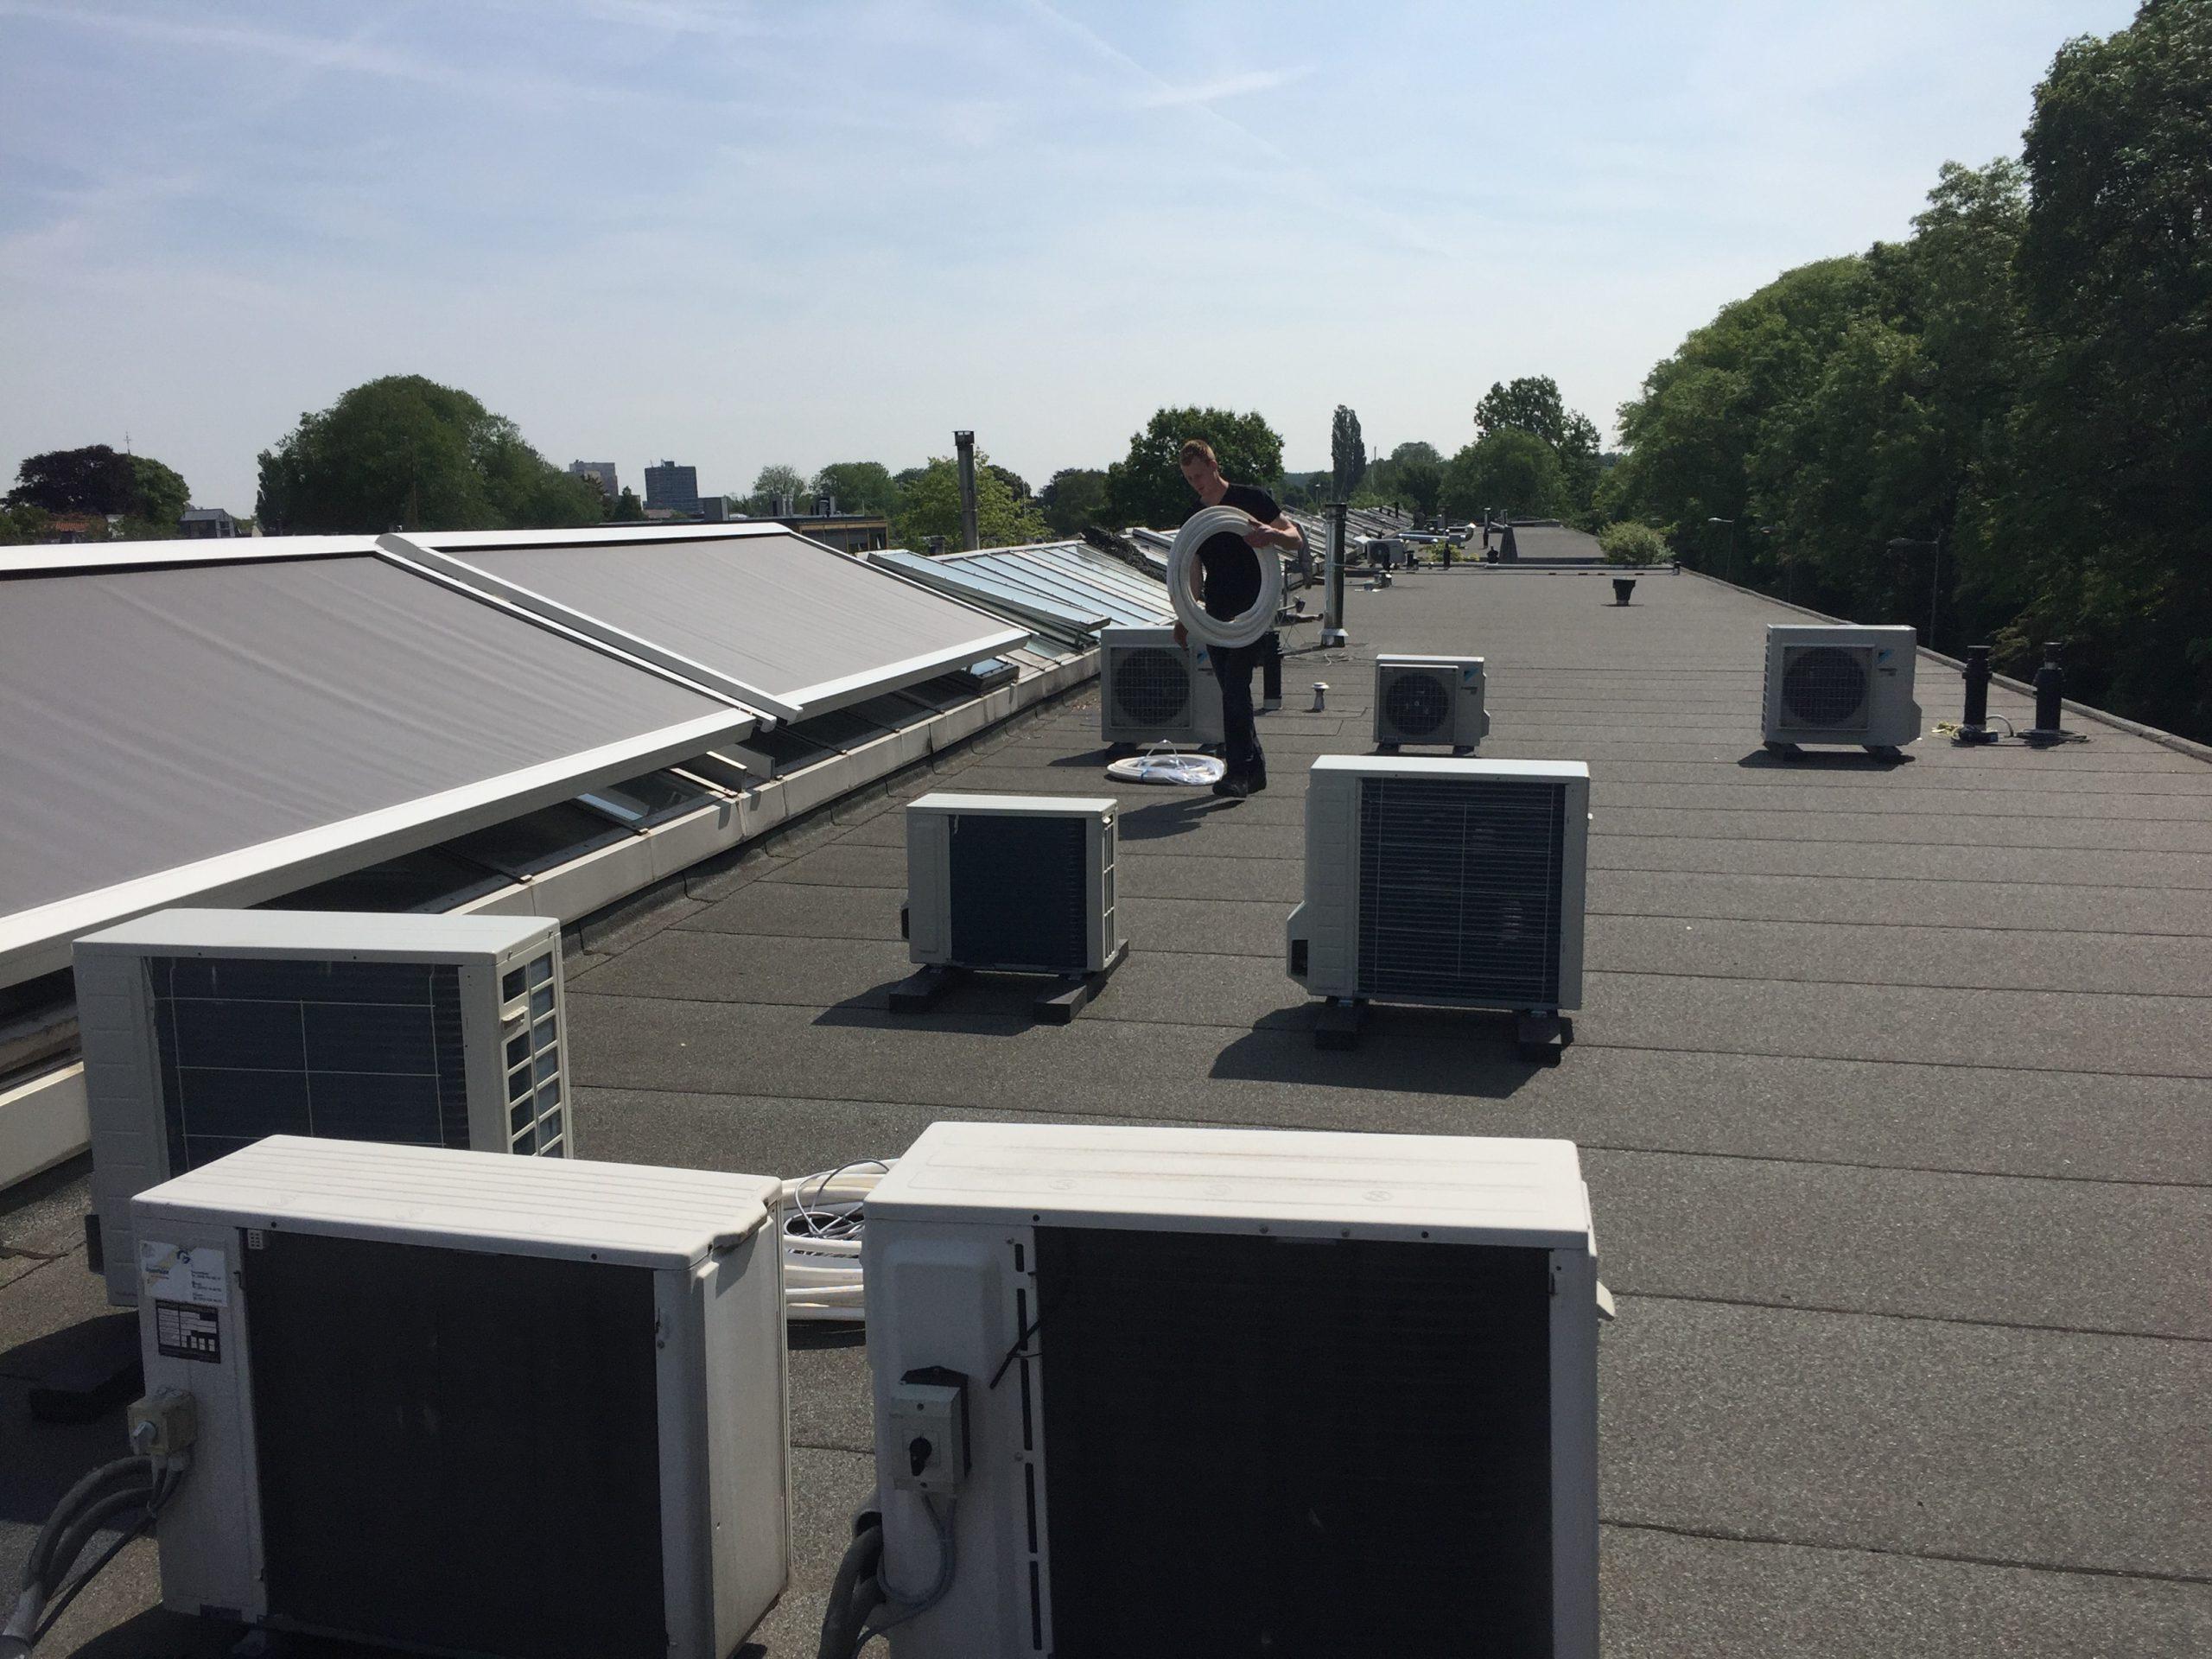 Spruijt Klimaat - Hoogwerker Amsterdam airco VRV systeem Spruijt Klimaat dak